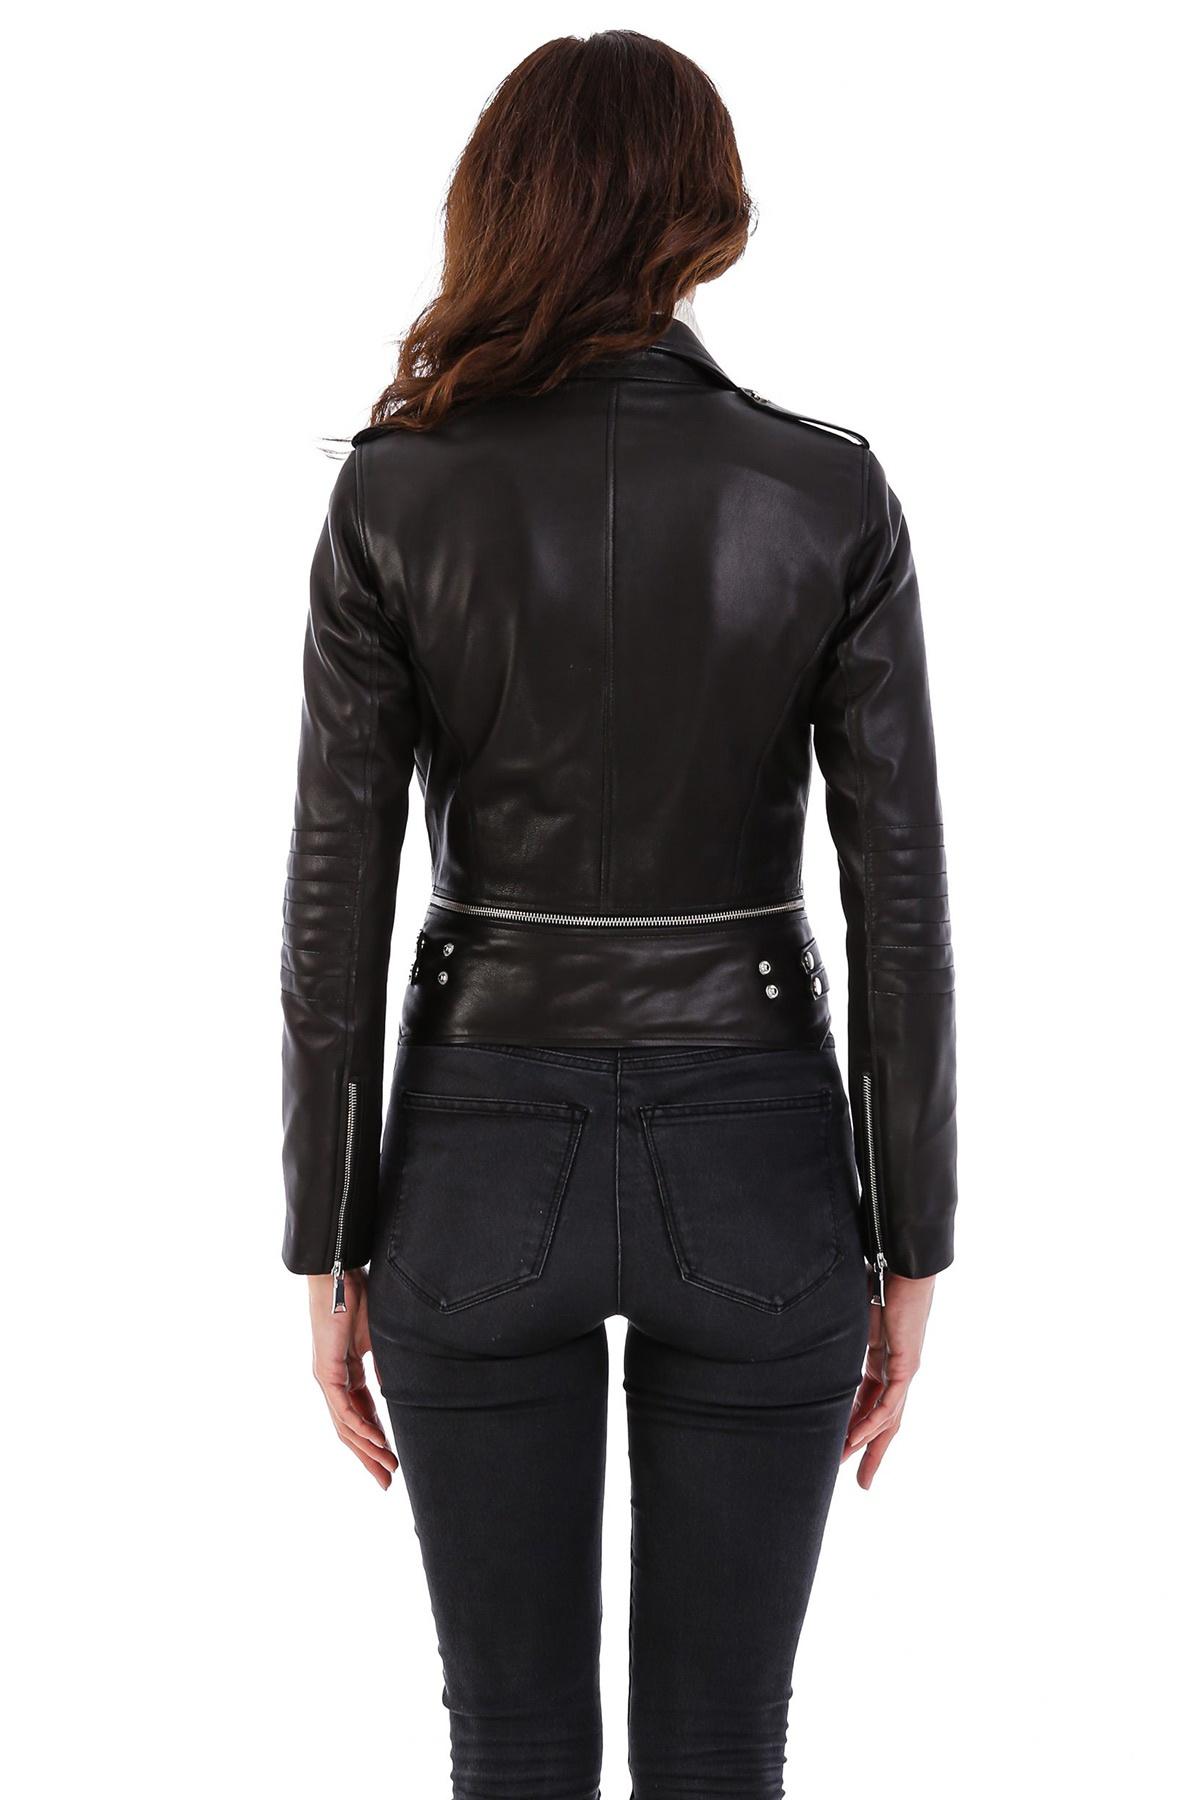 Leather Jacket Online